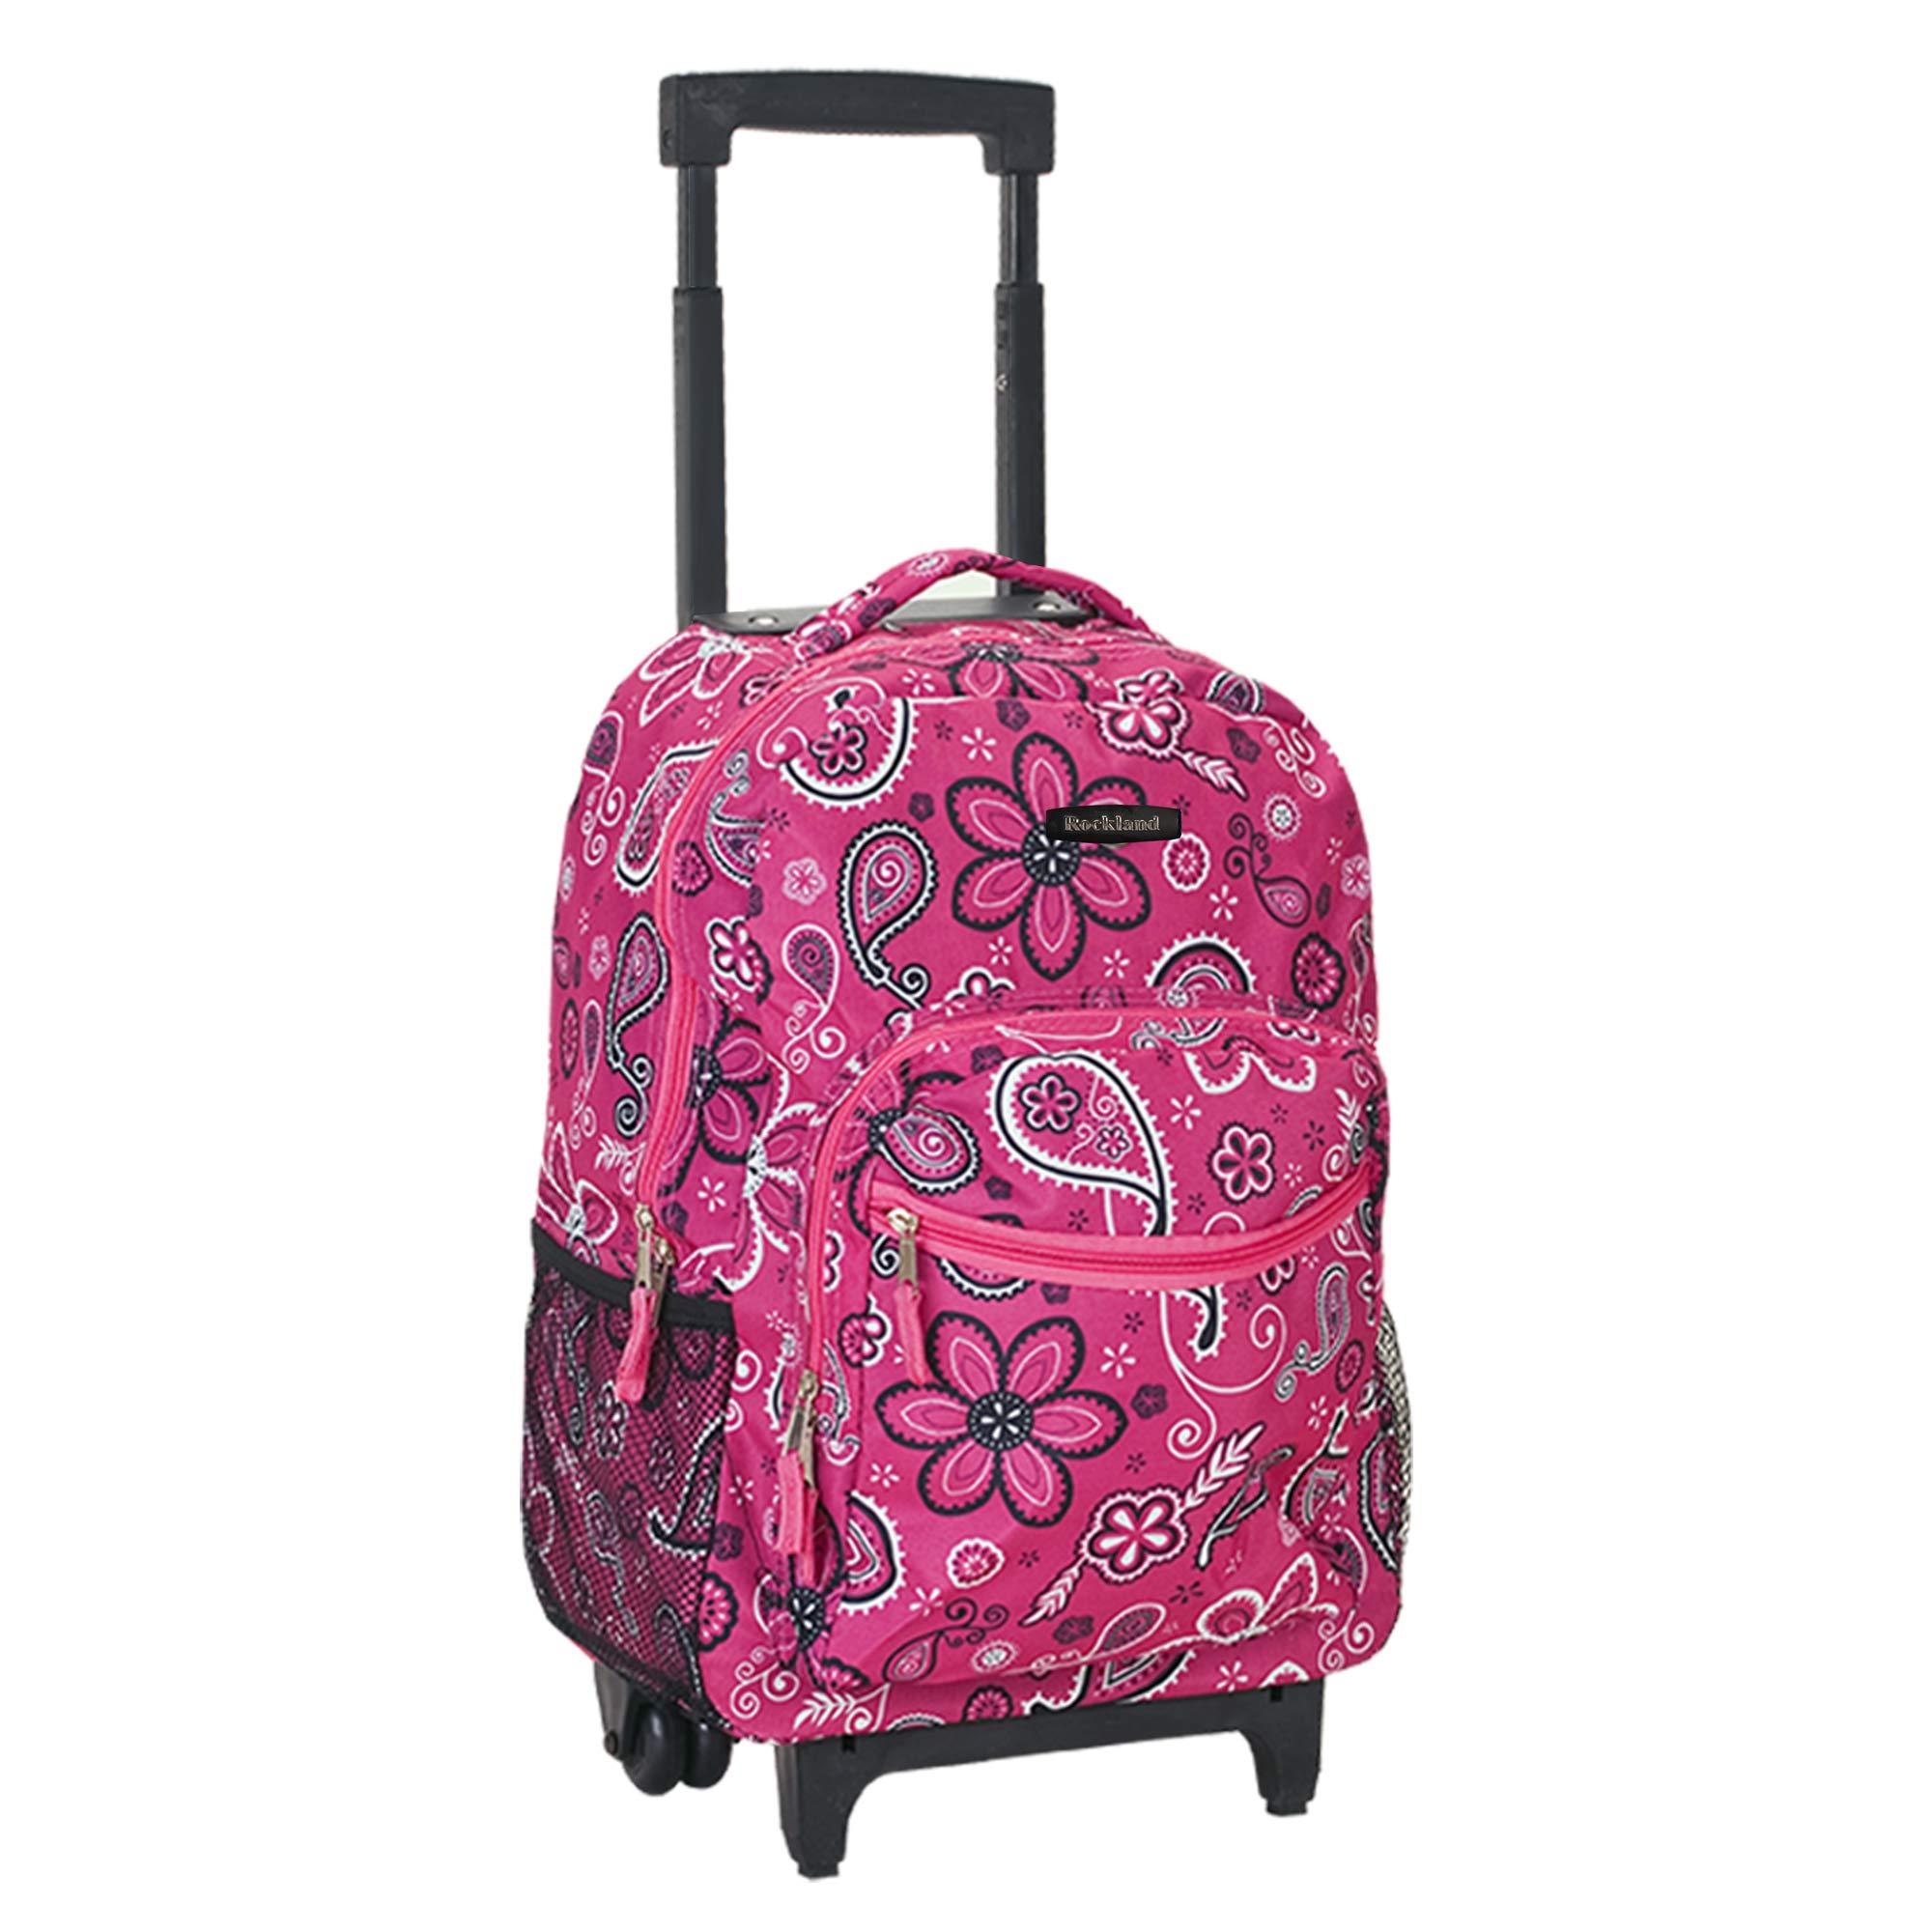 Rockland Luggage Rolling Backpack Bandana